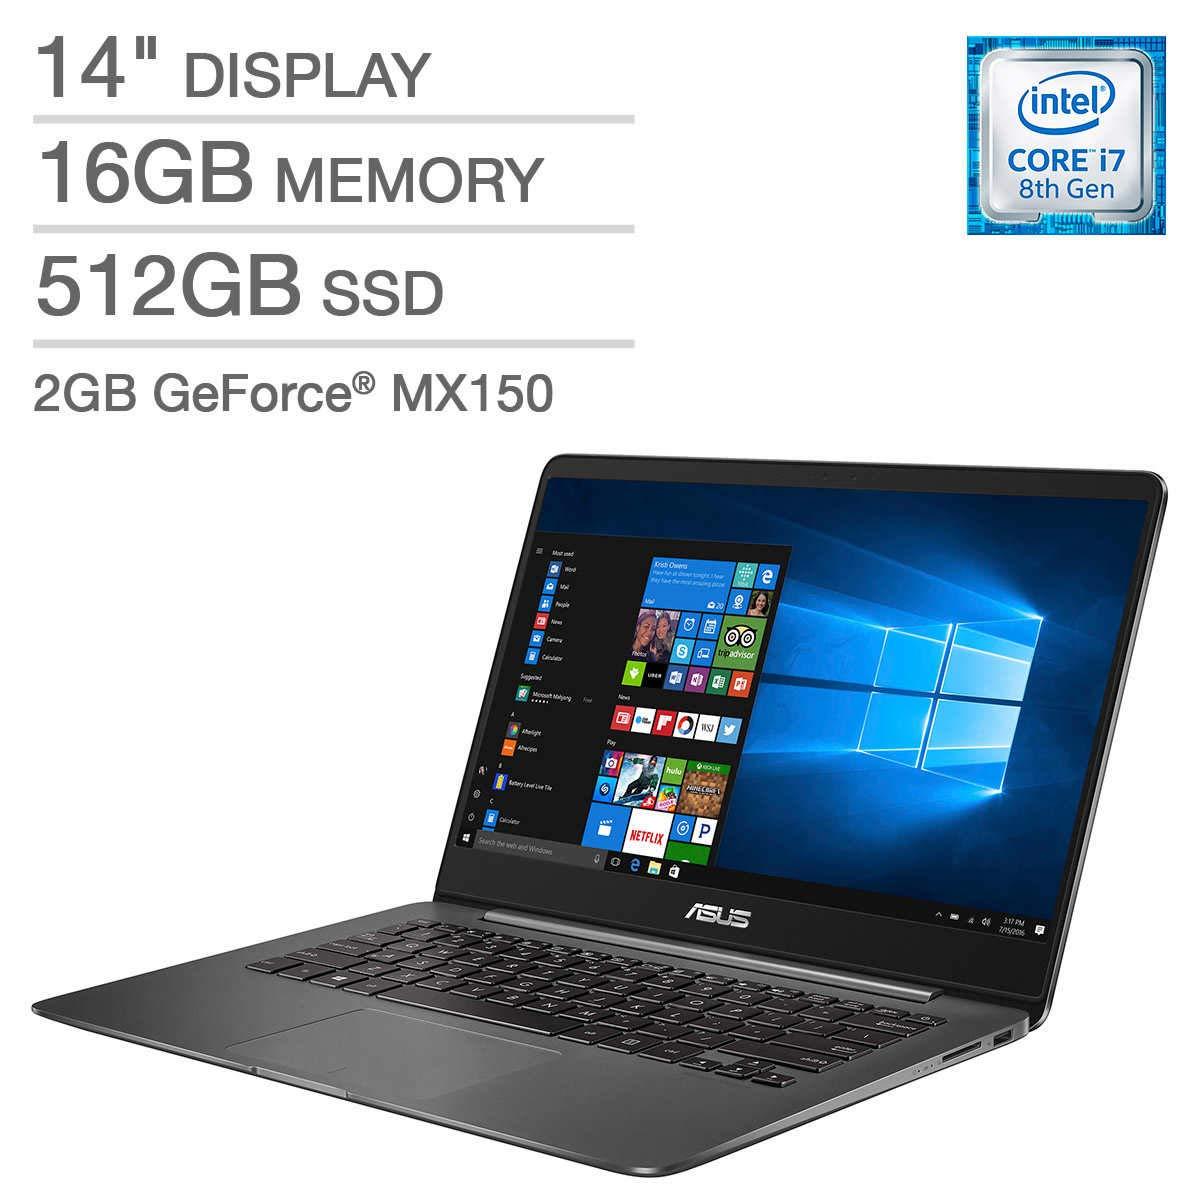 ASUS ZenBook UX430UN Laptop - Intel Core i7 - GeForce MX150 -1080p, 16GB LPDRR3 RAM, 512GB SATA M.2 Solid State Drive, Model UX430UN-IH74-GR